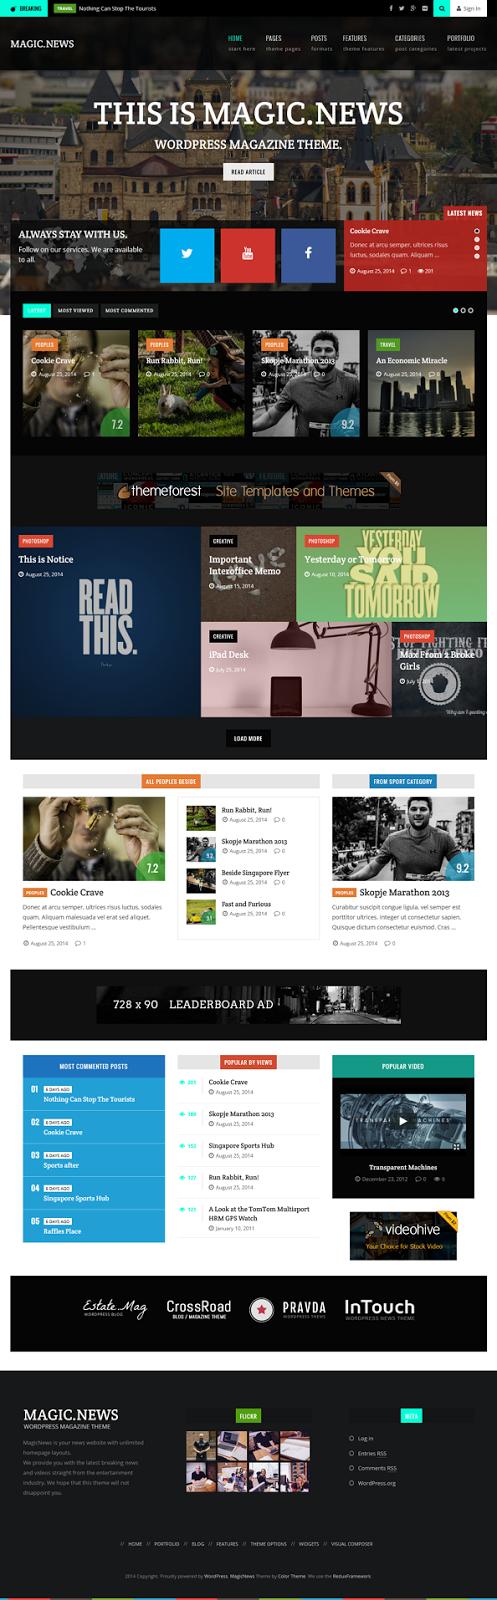 MagicNews Responsive WordPress Magazine Theme